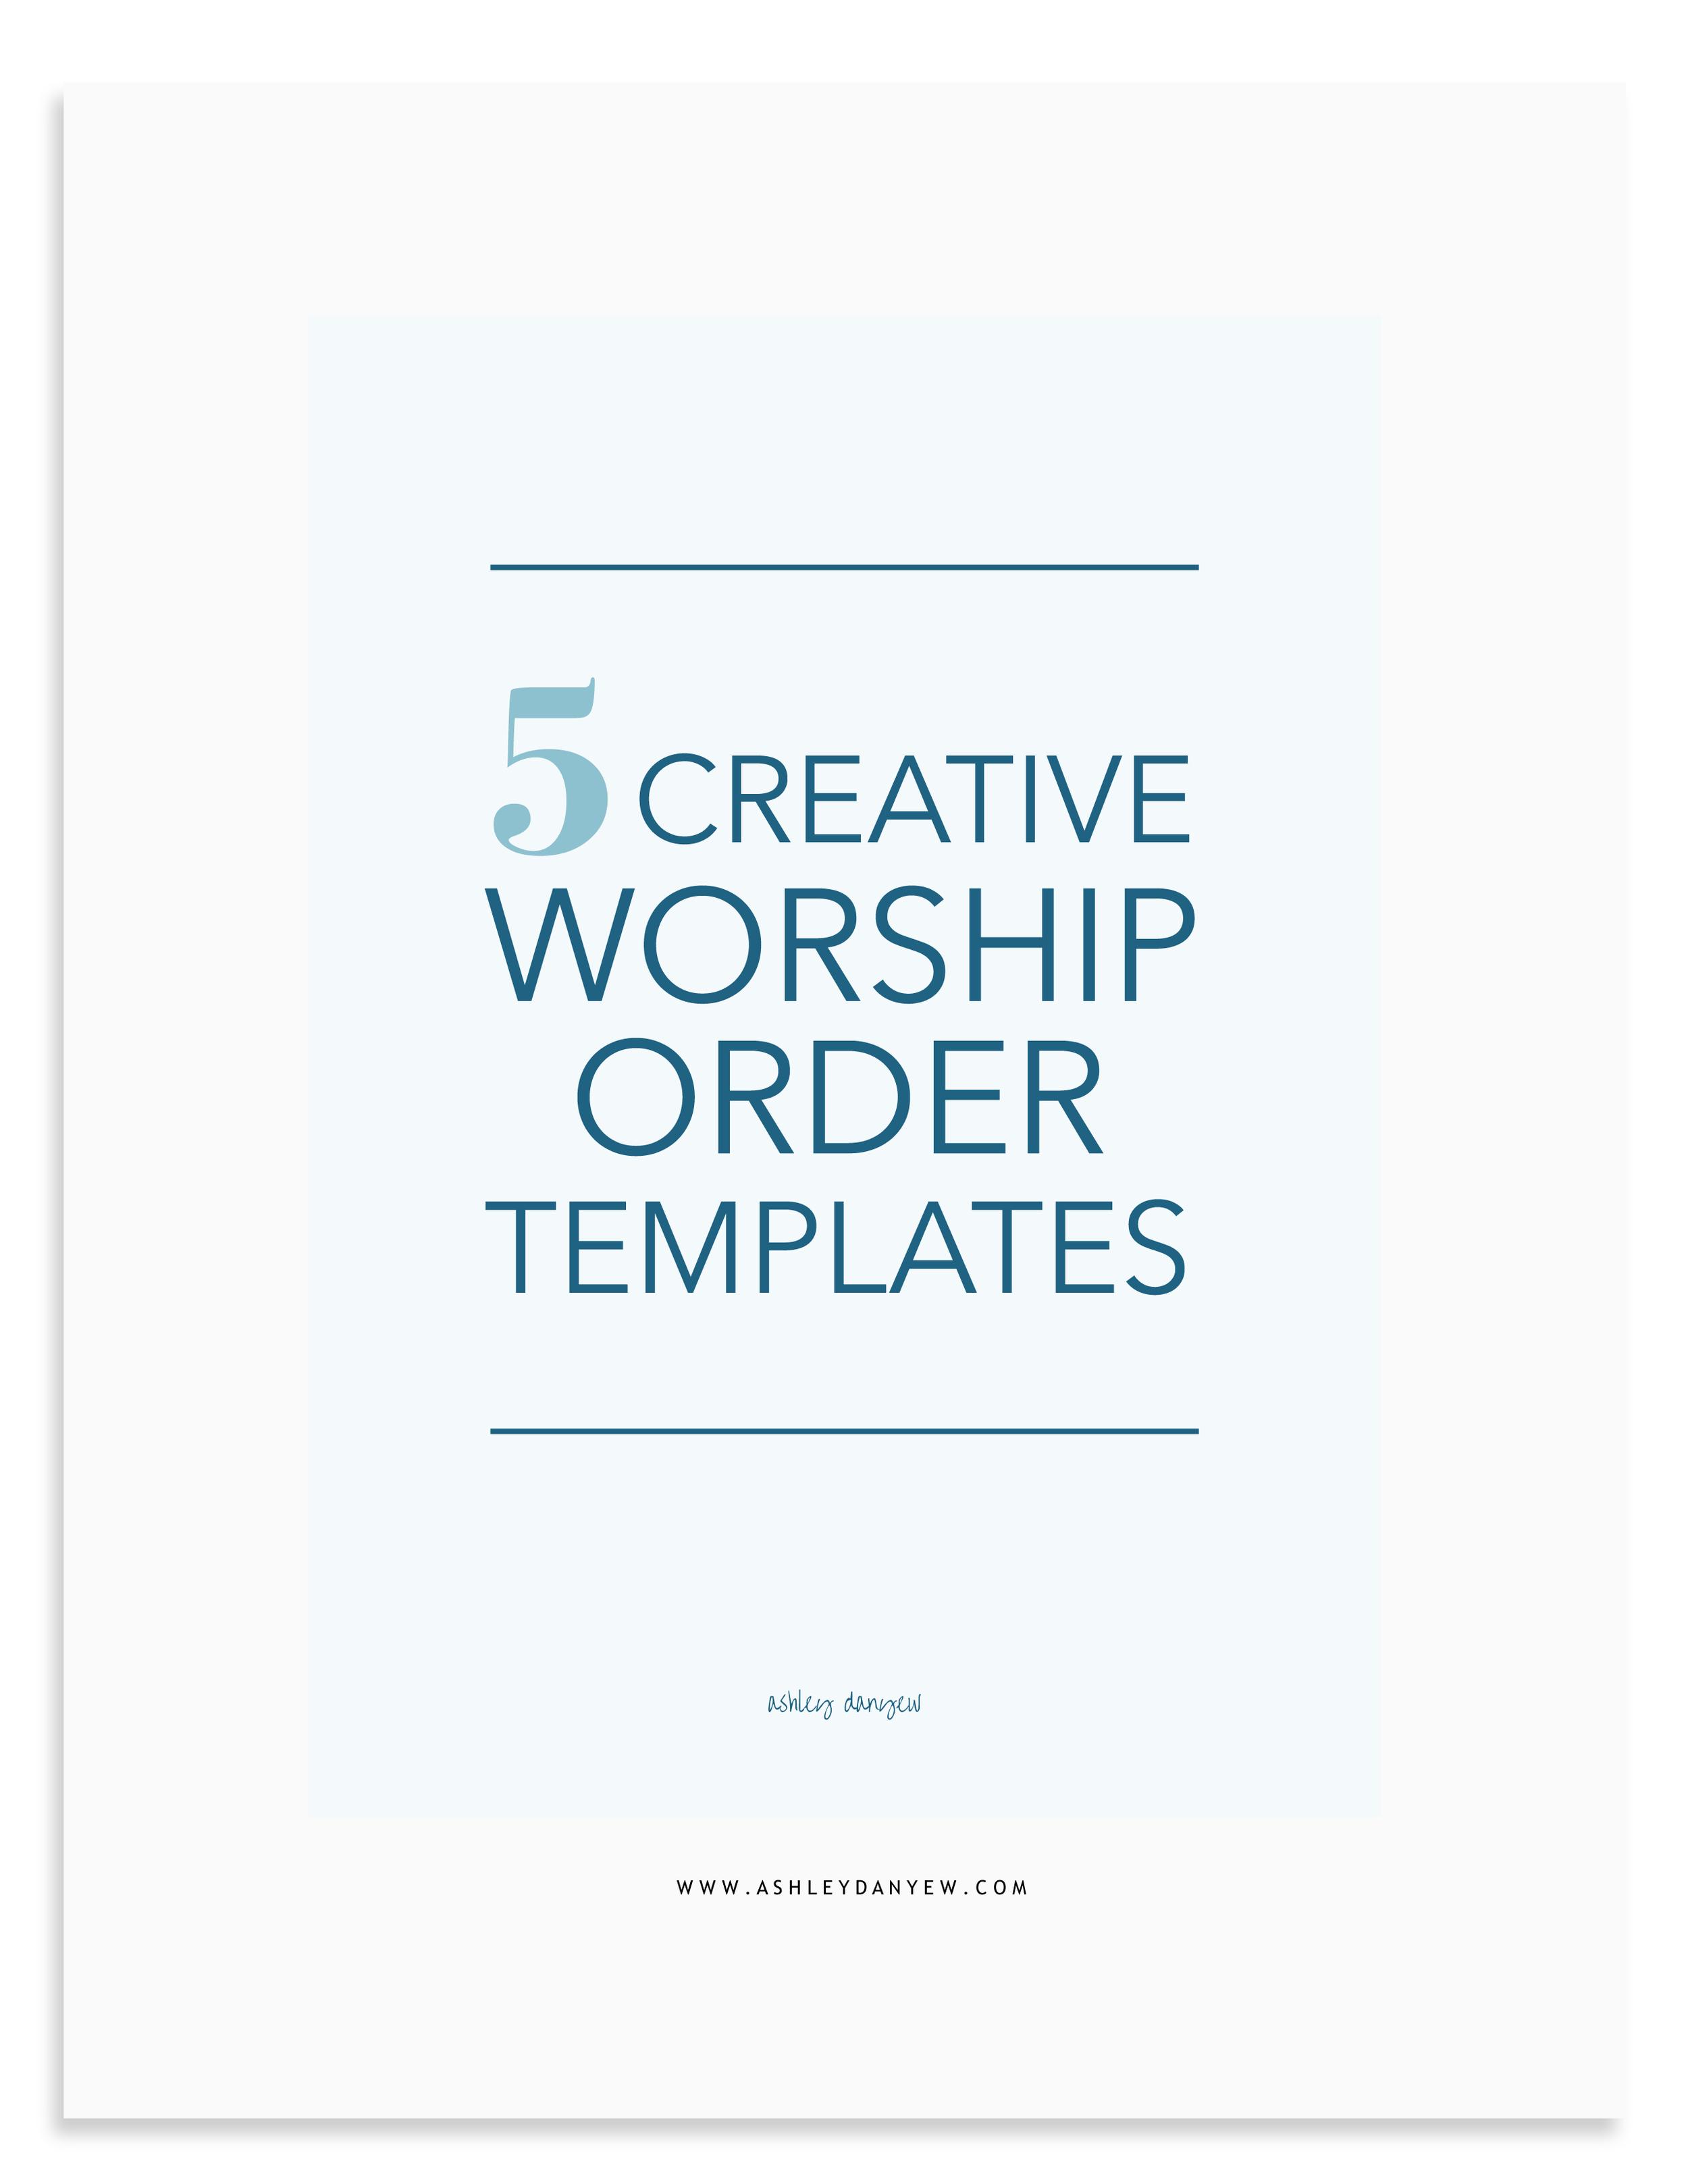 5 Creative Worship Order Templates_Ashley Danyew.png